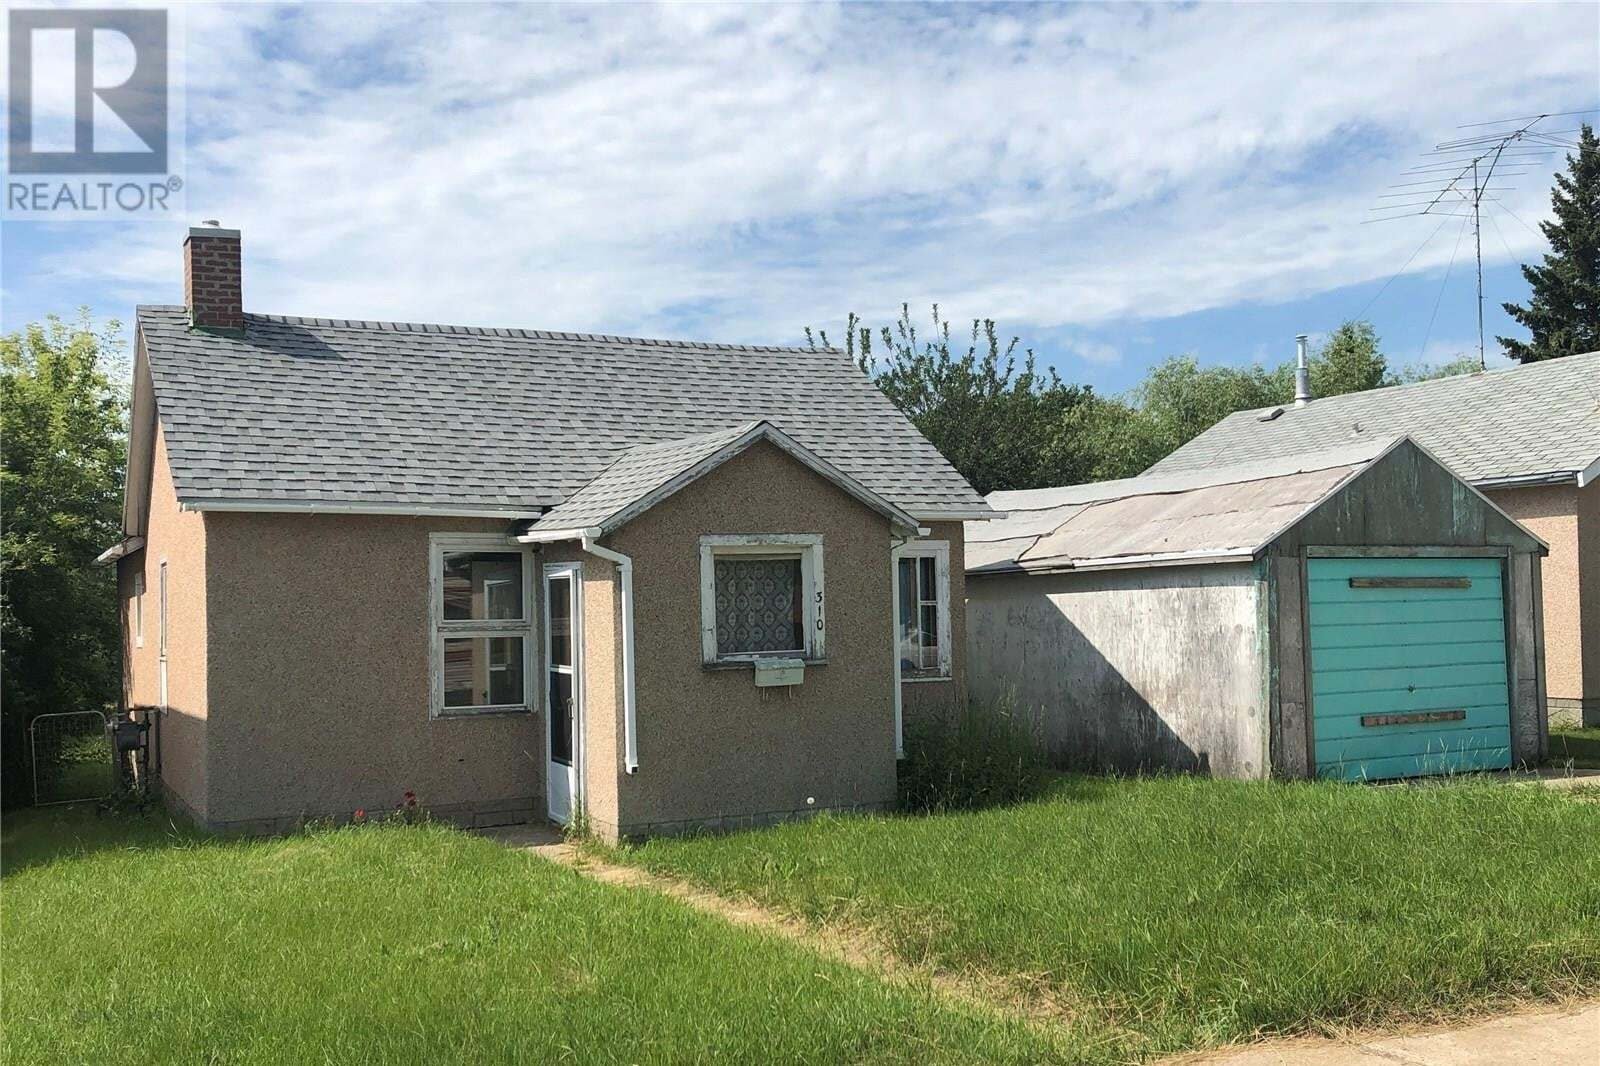 House for sale at 310 3rd Ave W Biggar Saskatchewan - MLS: SK819166